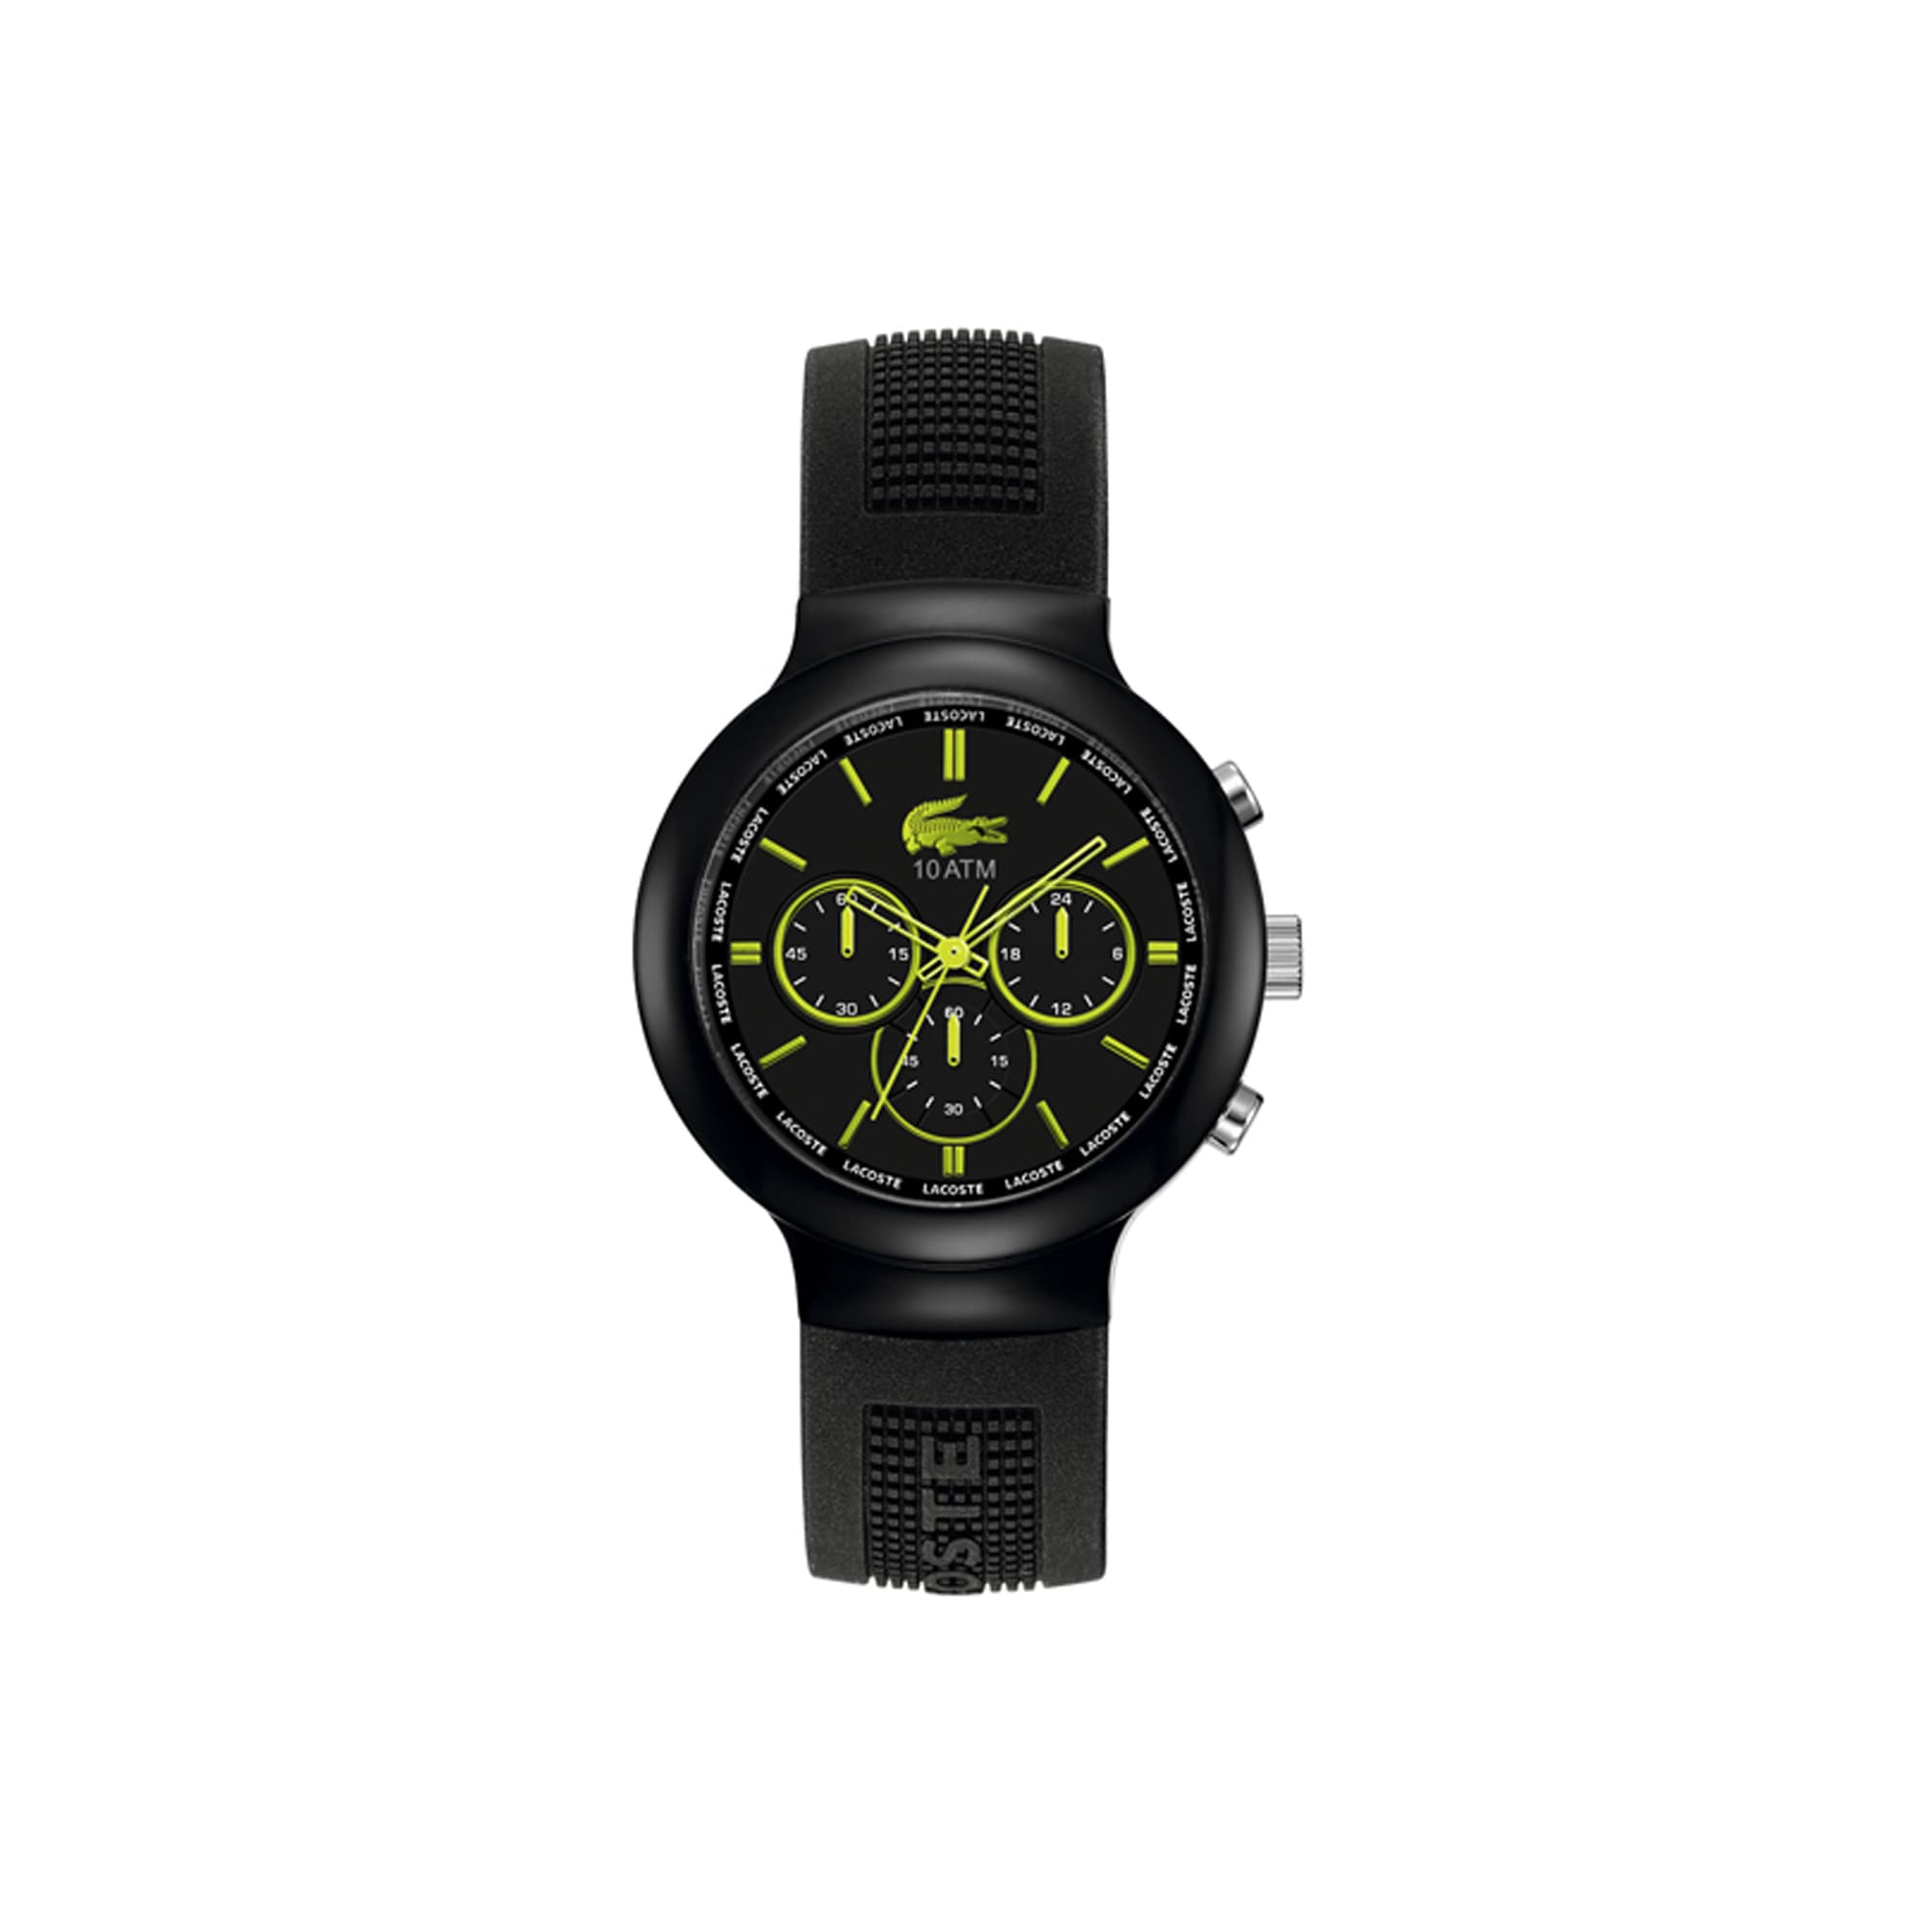 Bornéo watch with chronograph